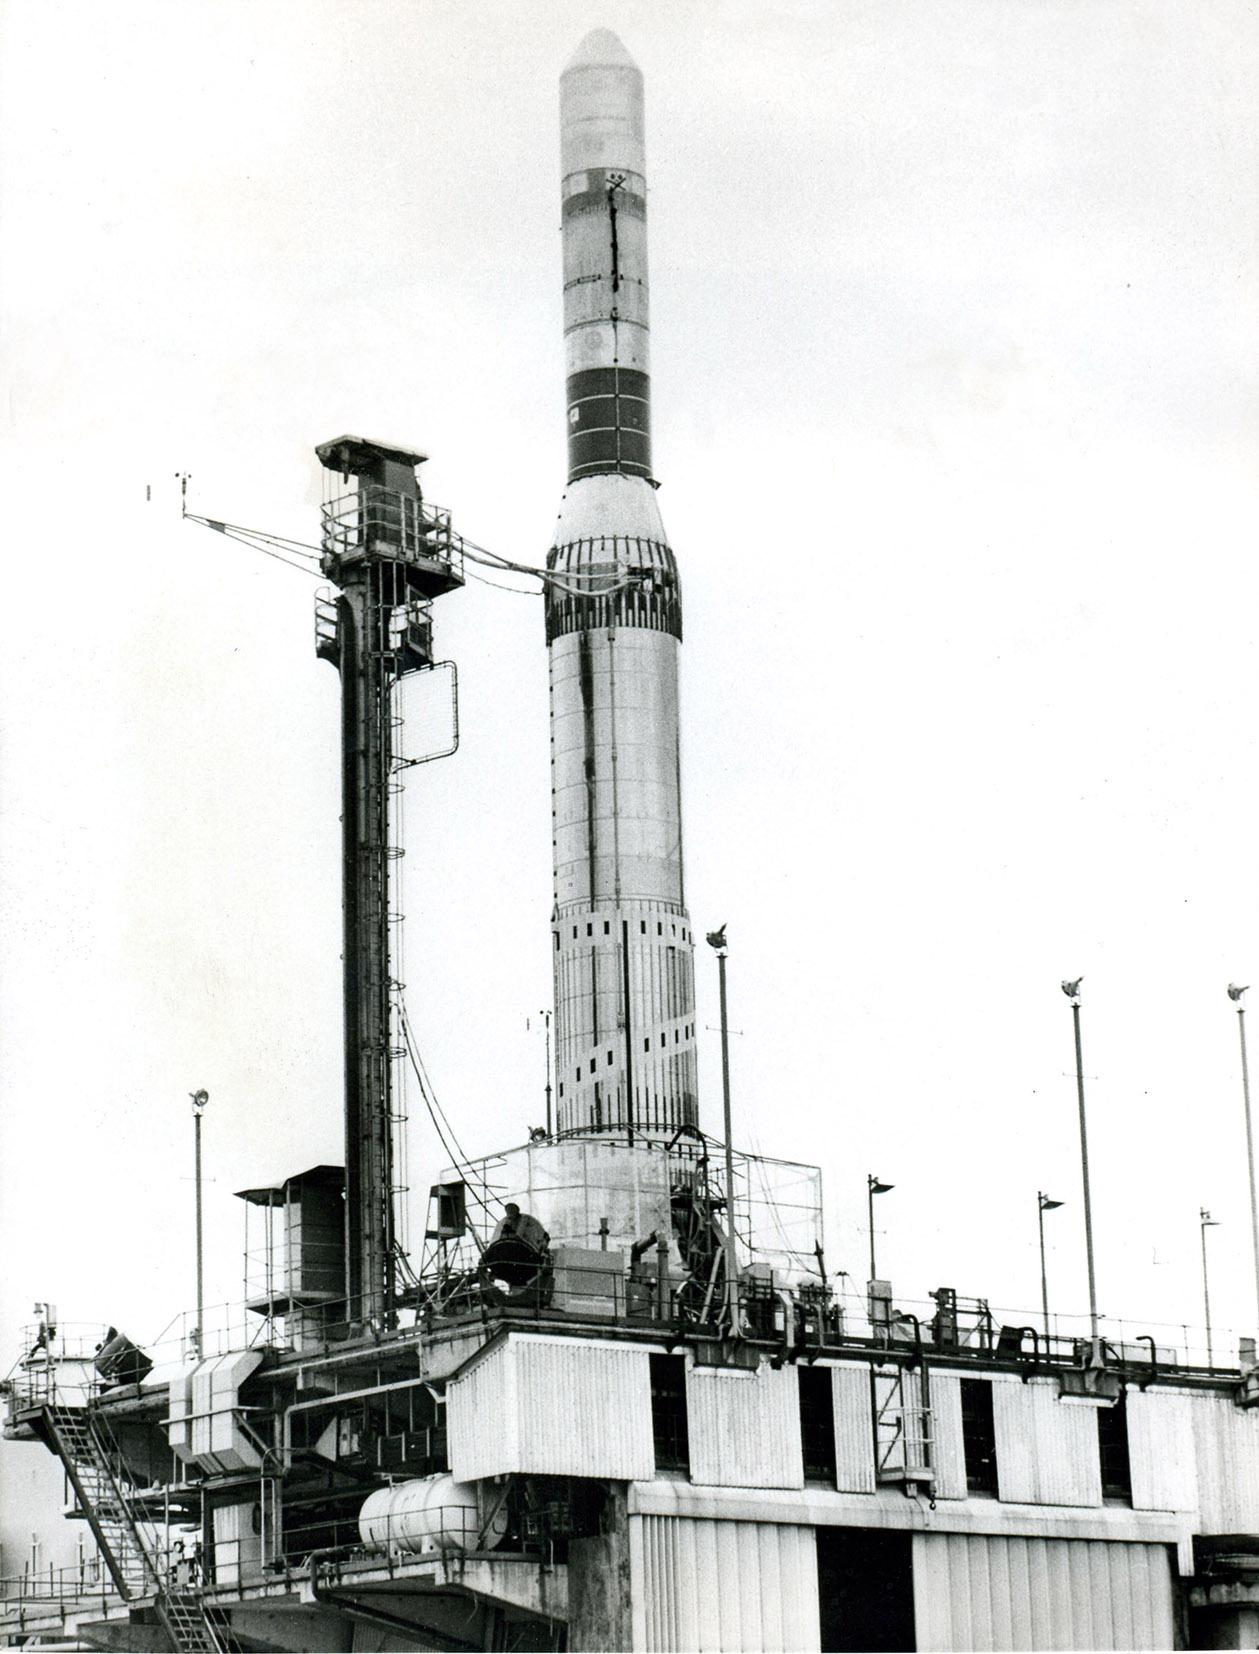 fusée Europa 1 F4 vue sur la plateforme de Spadeadam (Angleterre) le 24 juillet 1965